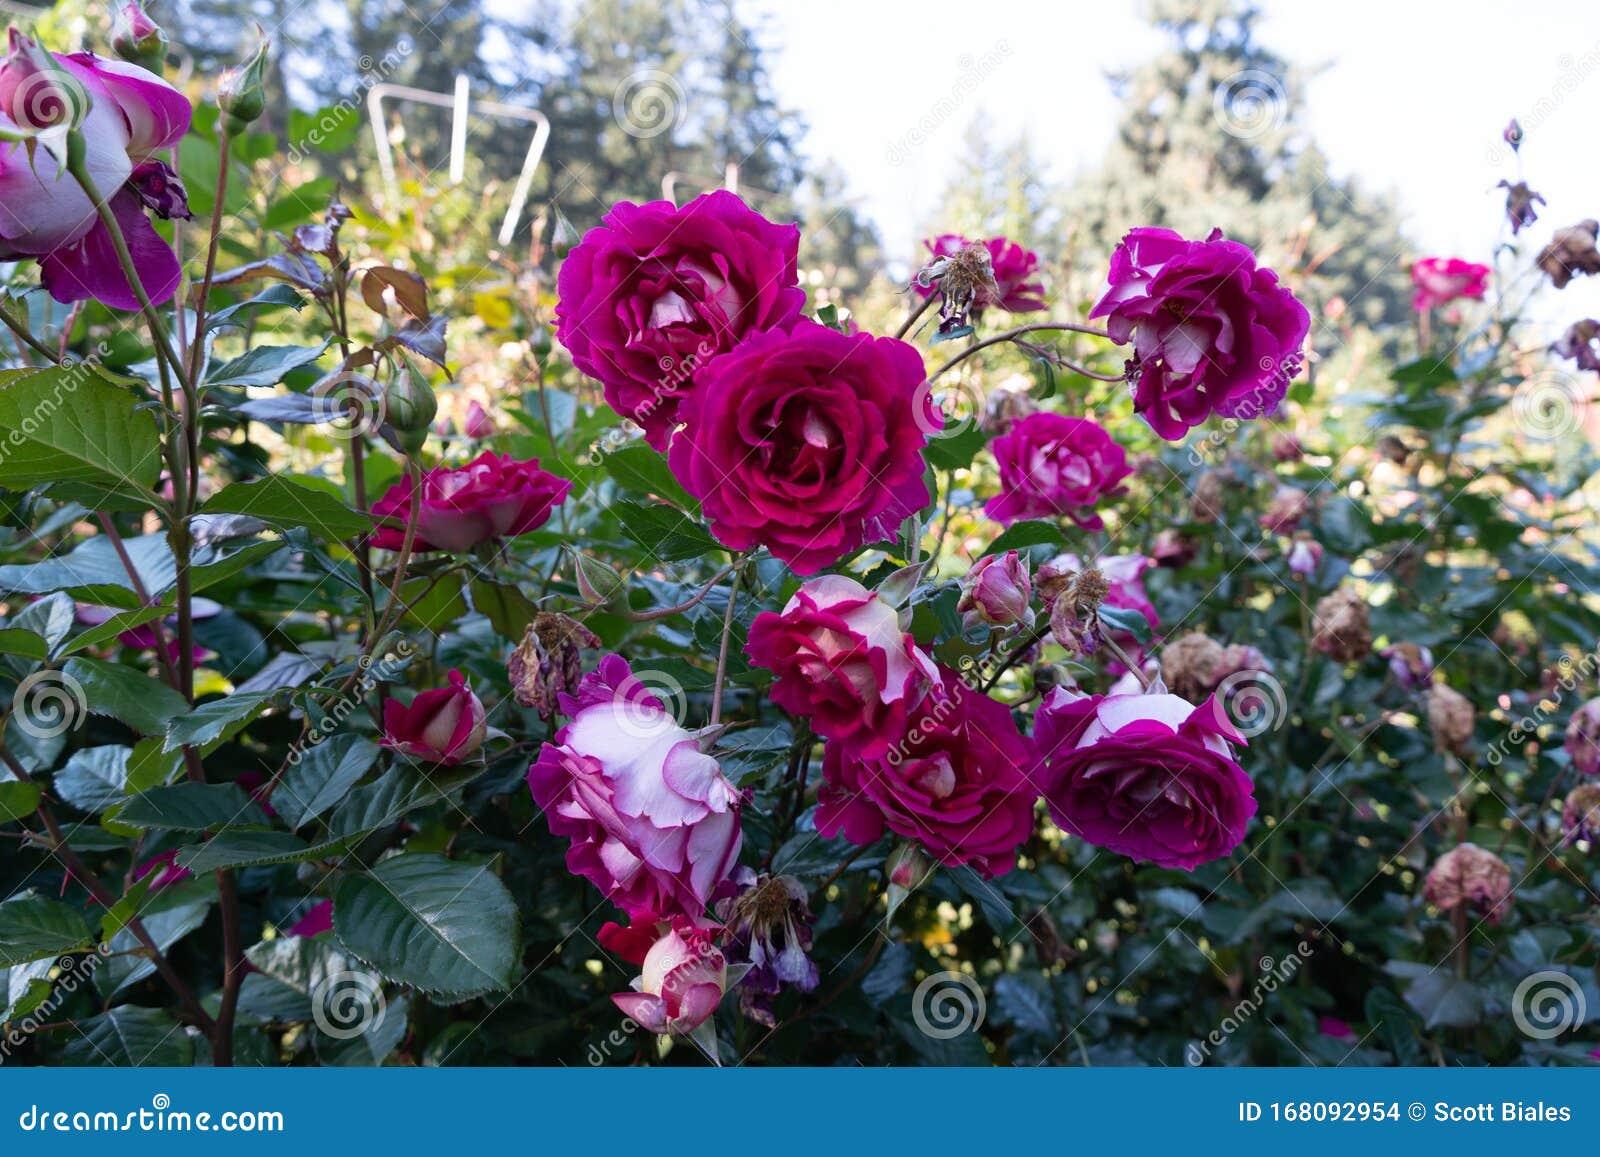 Portland Rose Garden Stock Photo Image Of Natural Decorative